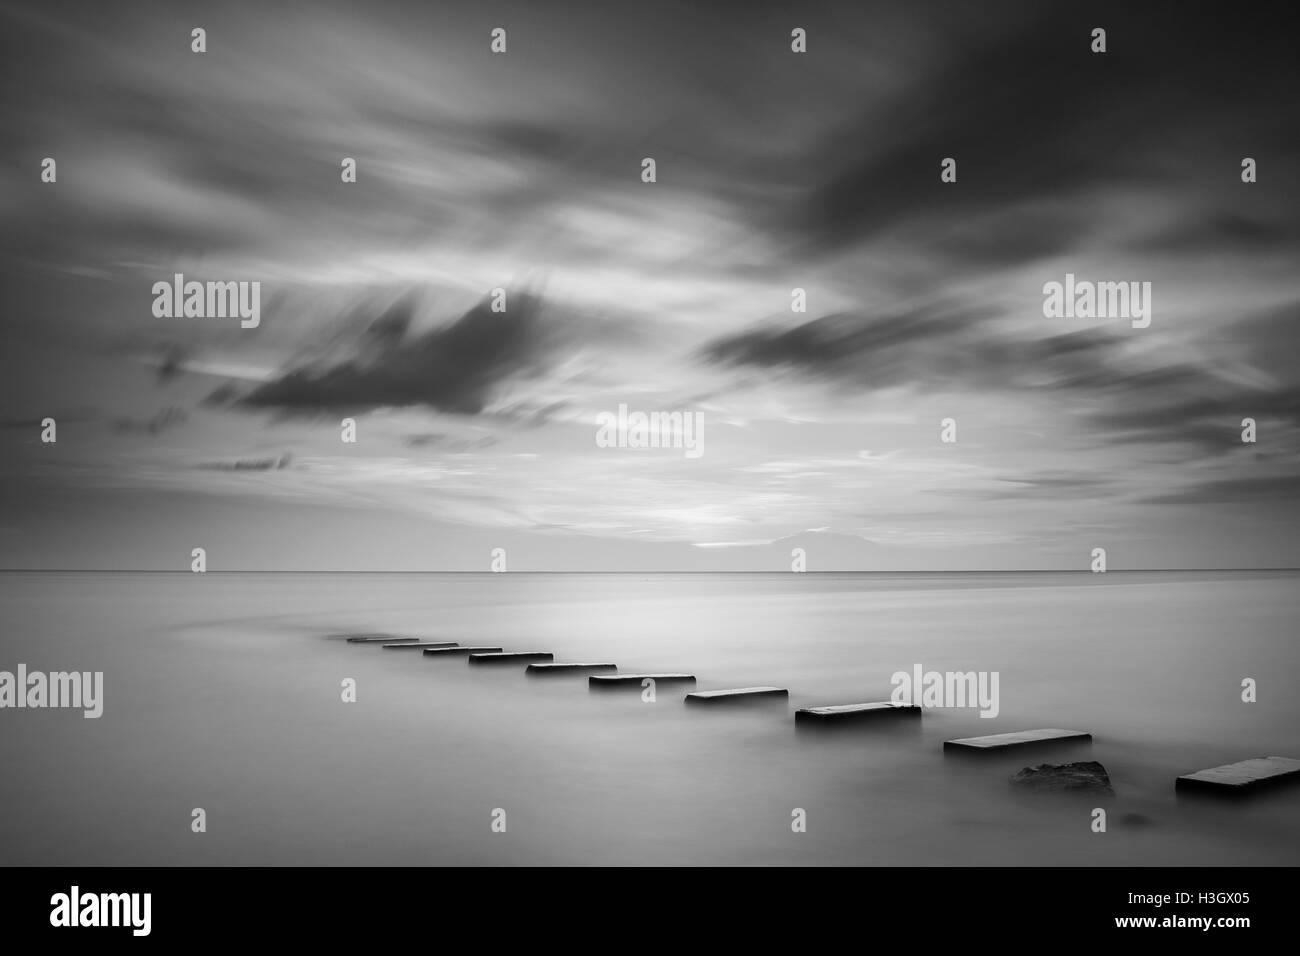 Long exposure image at Port Dickson - Stock Image